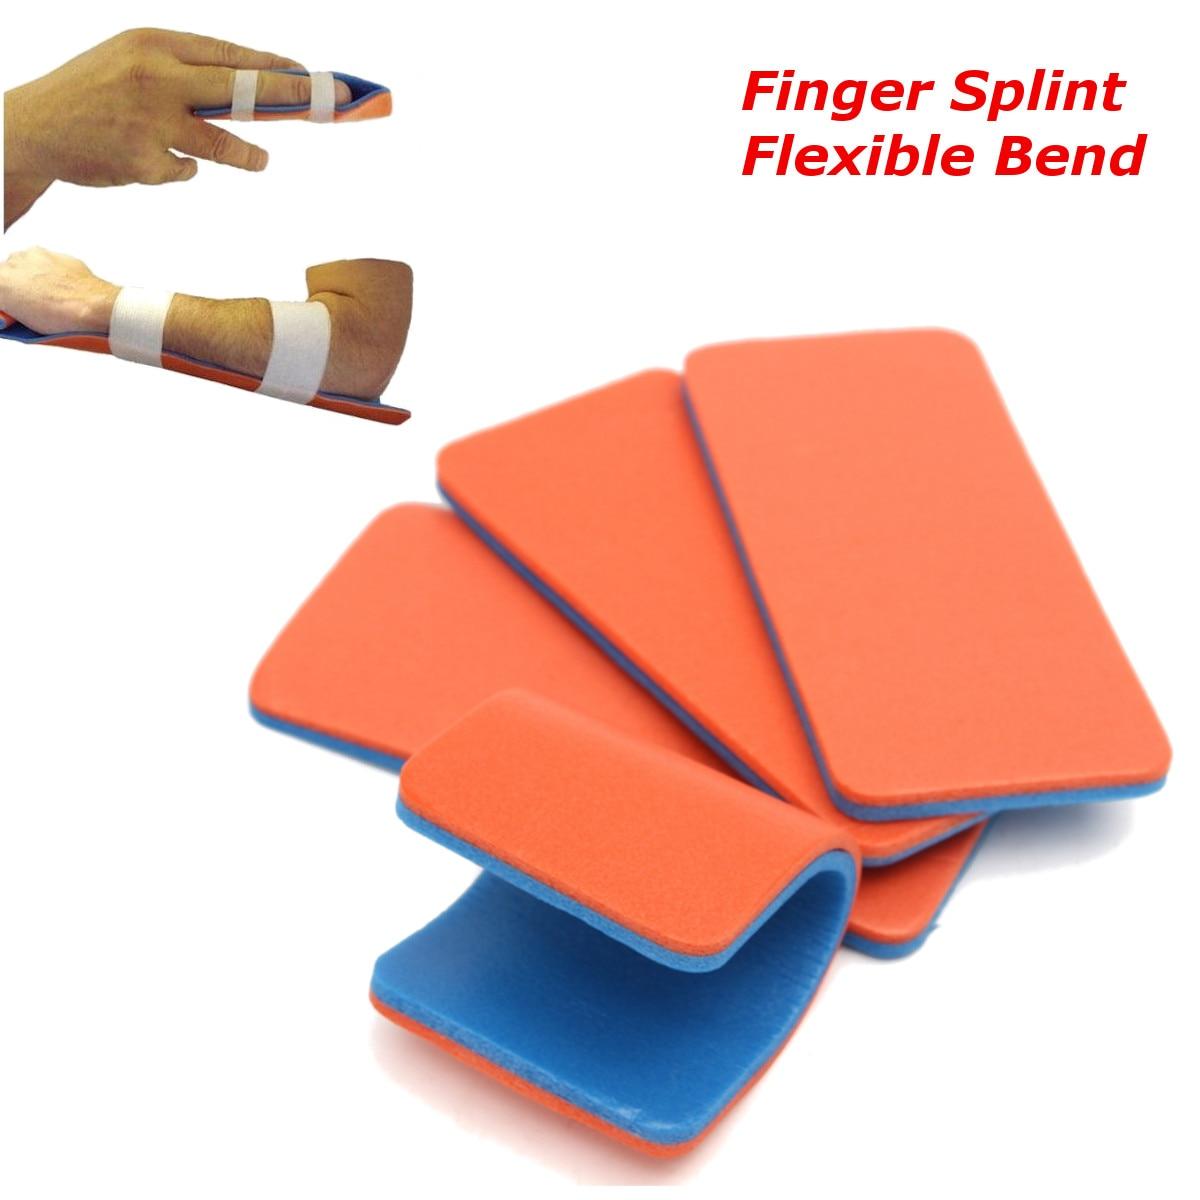 4Pcs Finger Splint Aluminum Medical Polymer Sam Orthopaedics Emergency First Aid Kit Treatment Kits